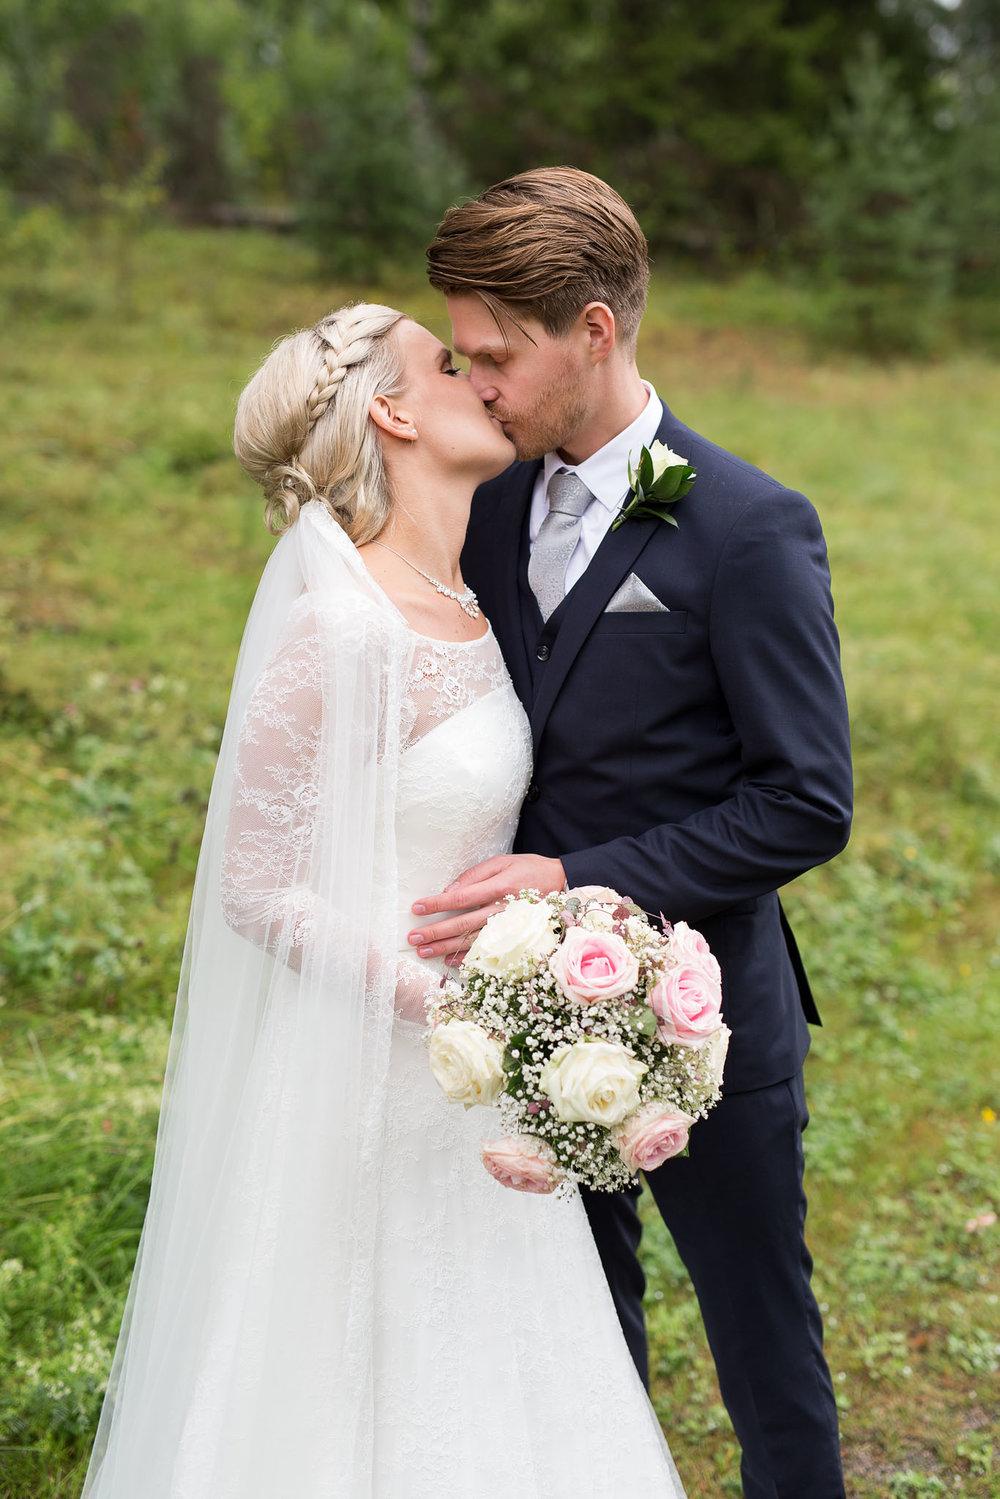 fotograf sabina wixner hudiksvall bröllop 31.jpg